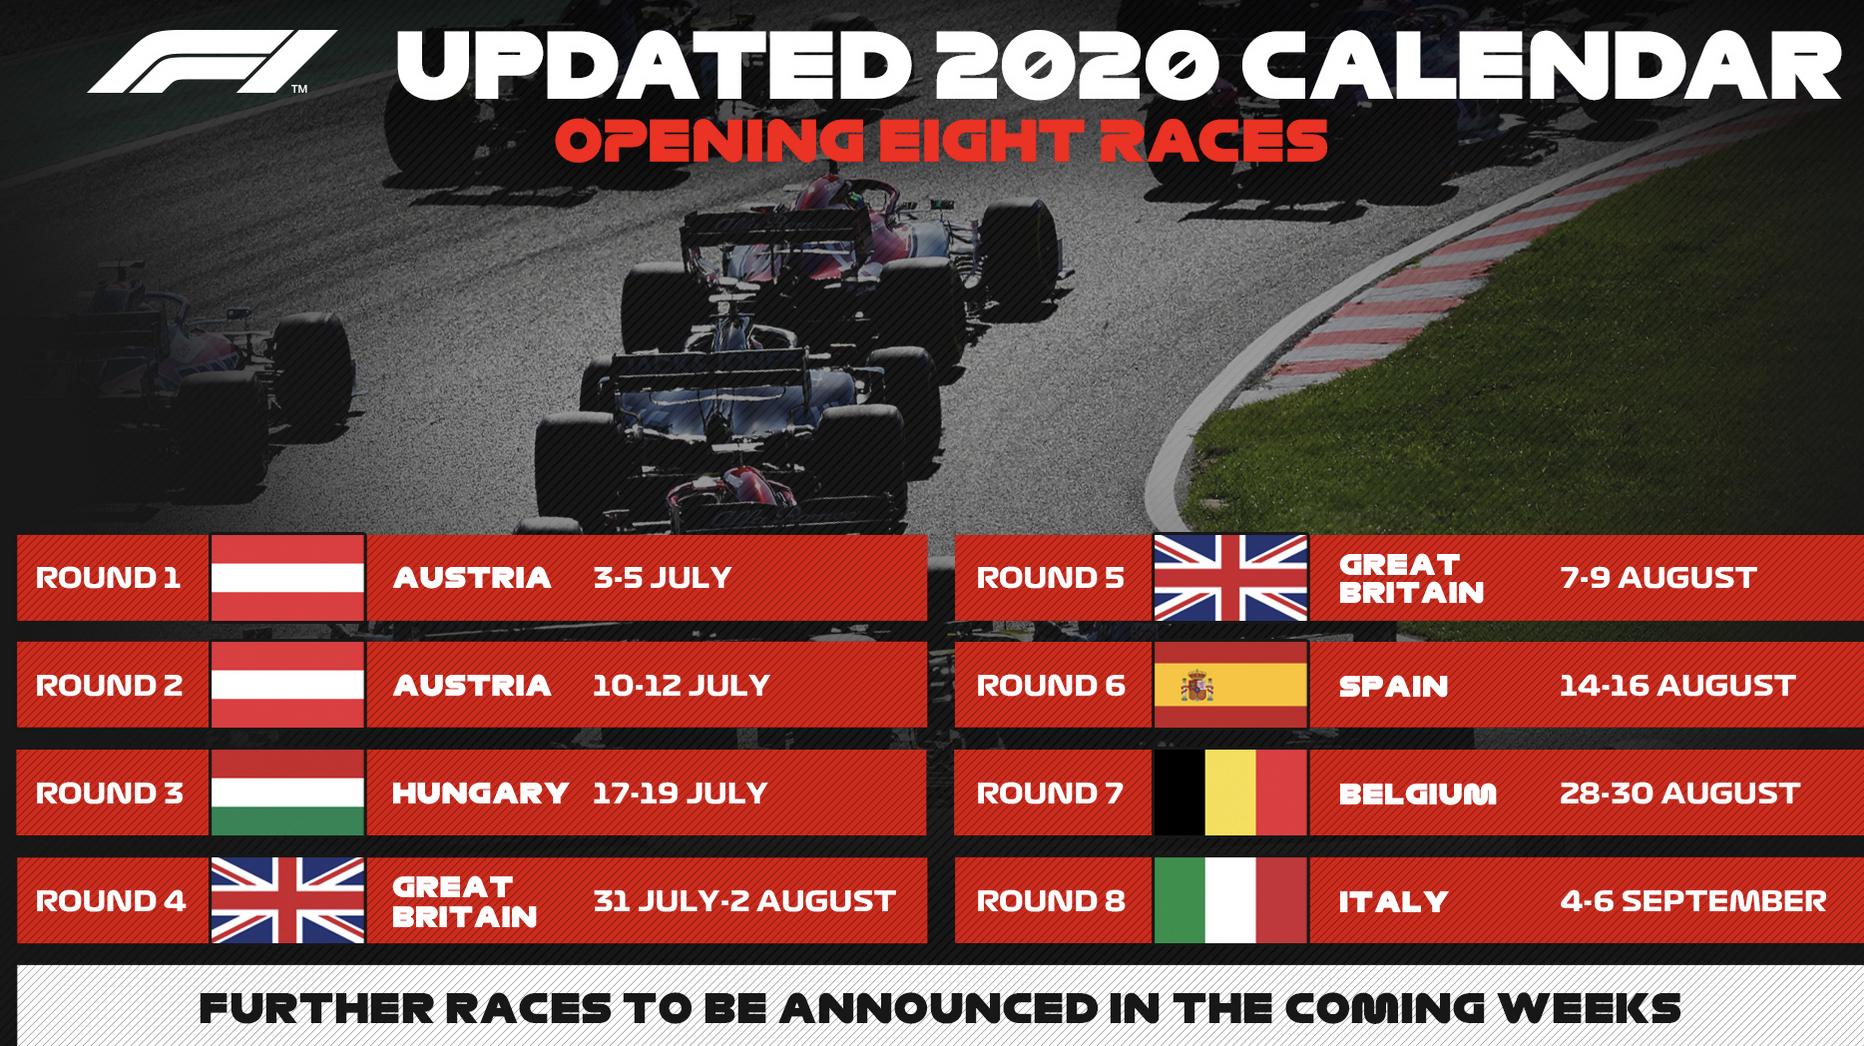 MotoGP, Provisional F1 calendar: many clashing dates with MotoGP